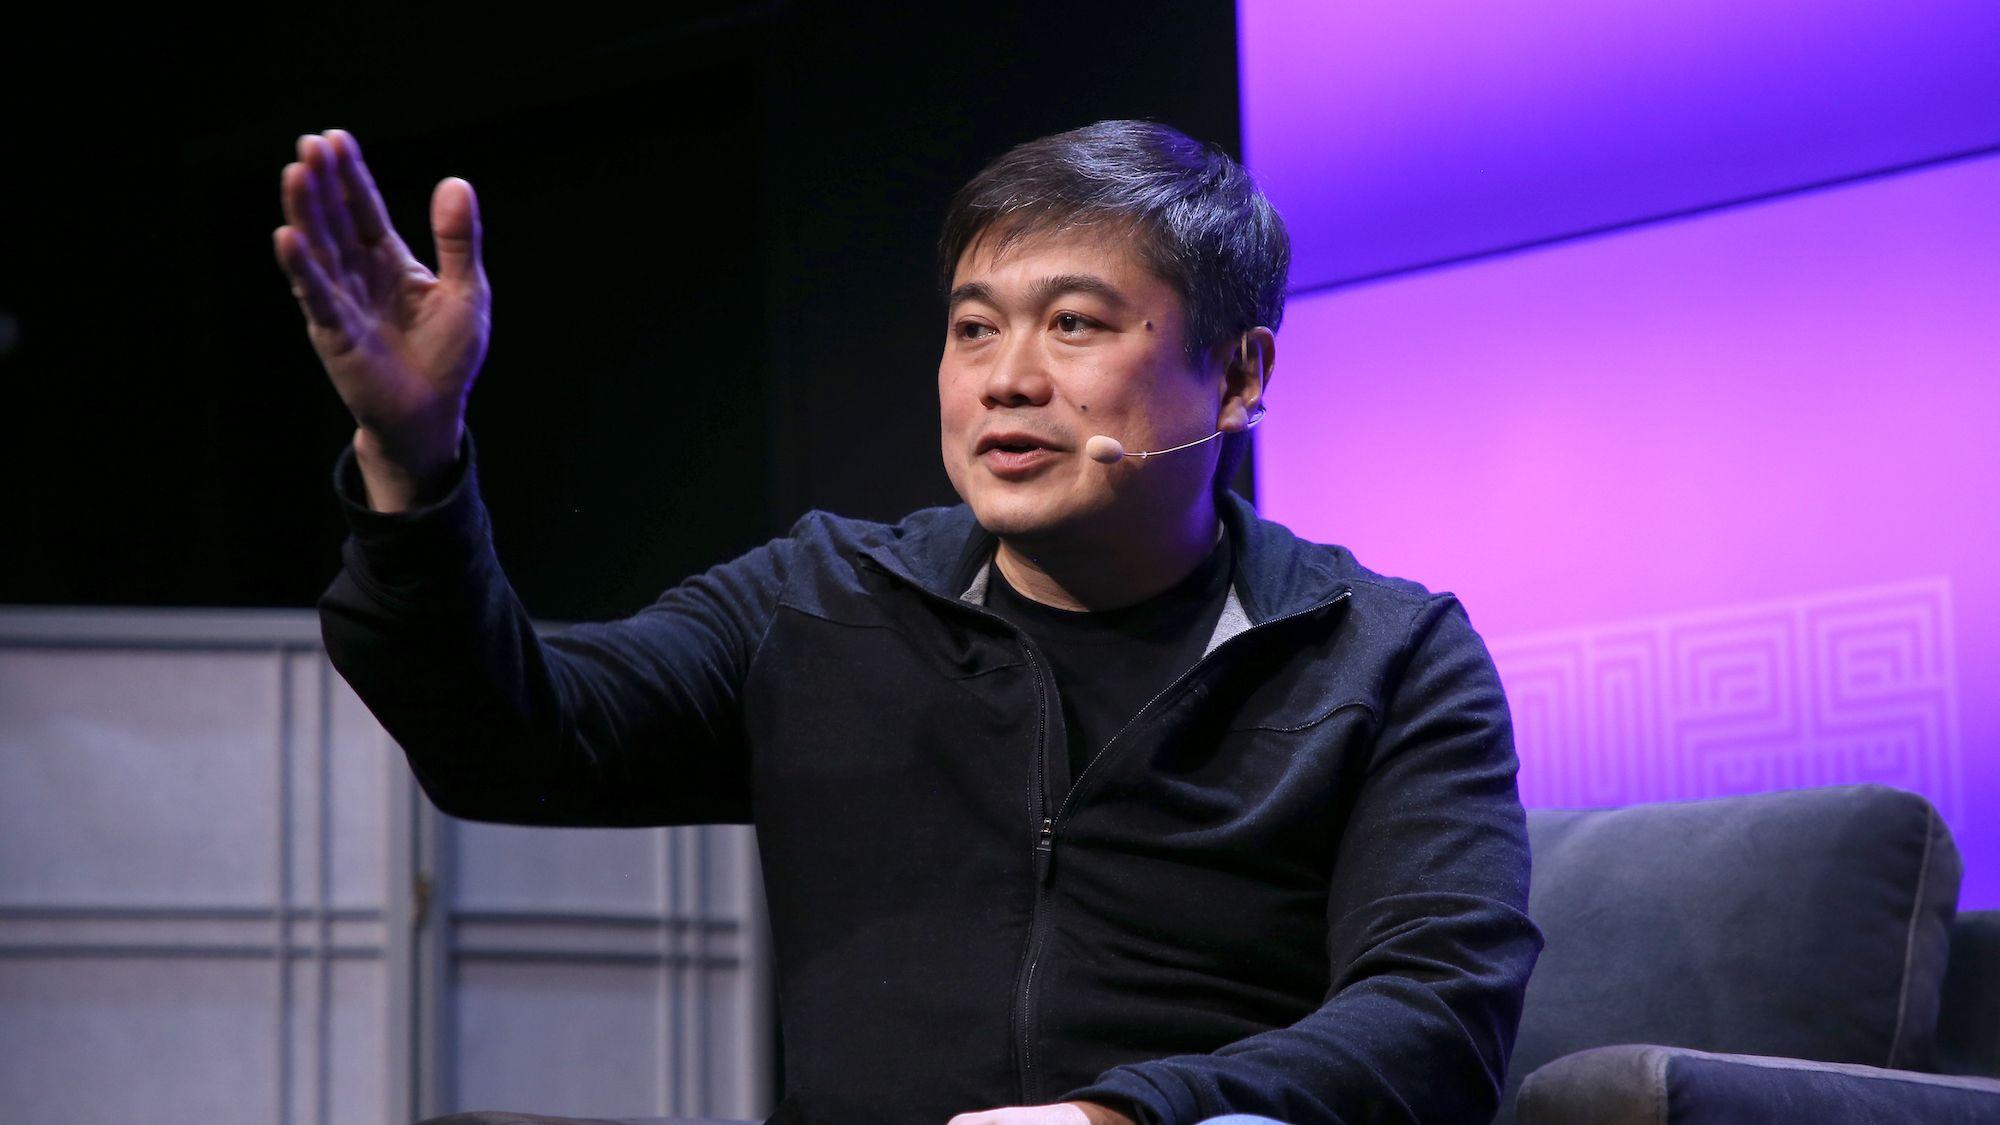 MIT Tech Review: MITメディアラボの伊藤穰一所長が辞任